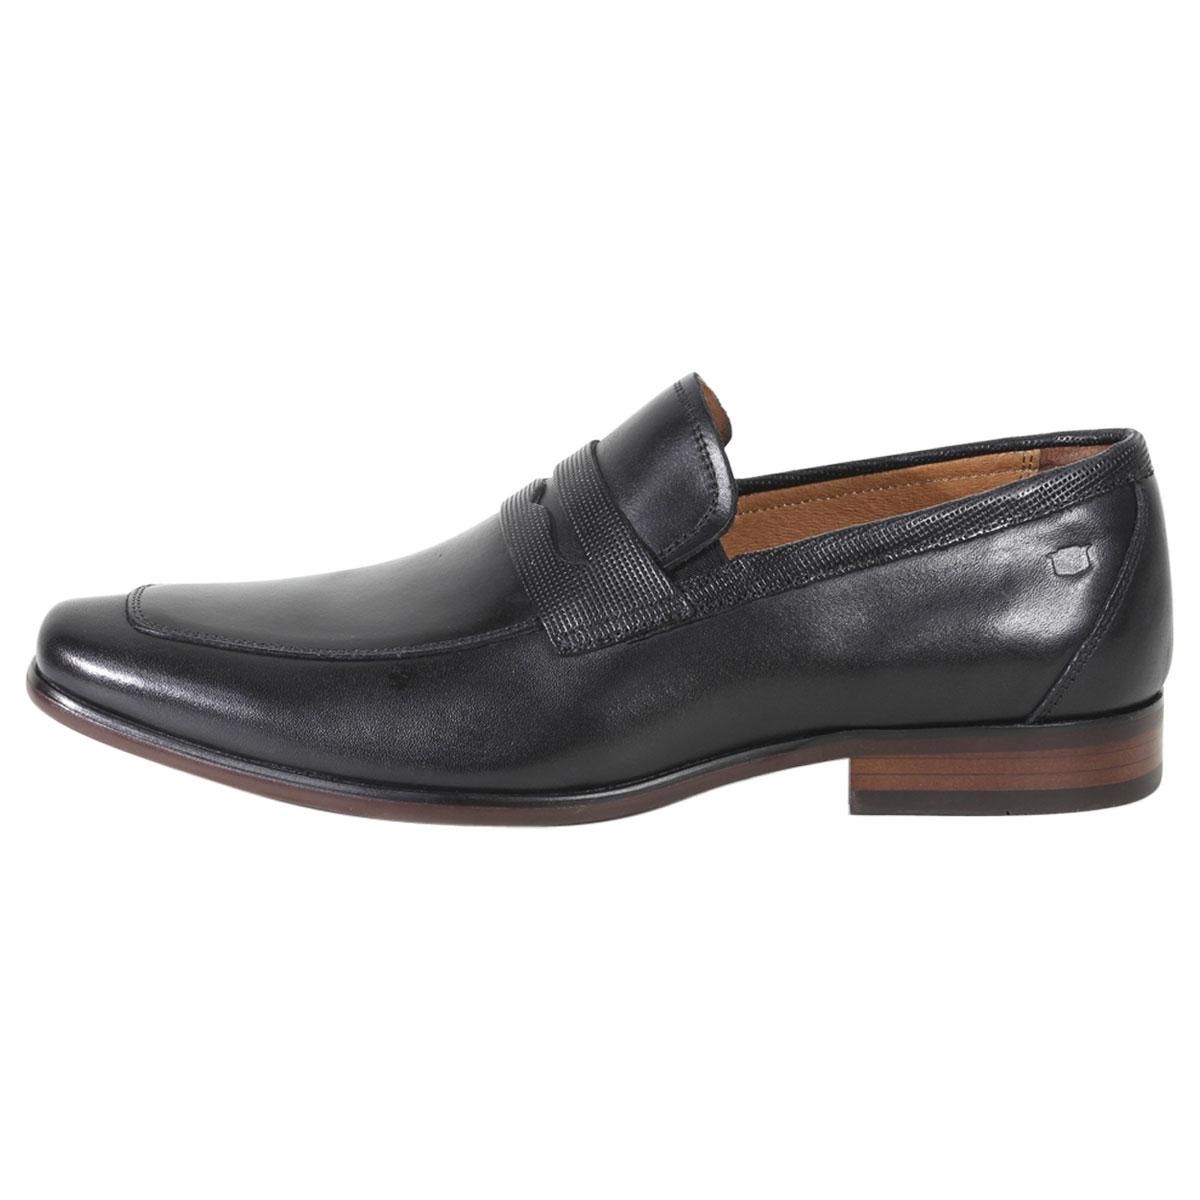 Florsheim-Men-039-s-Postino-Penny-Loafers-Shoes thumbnail 10